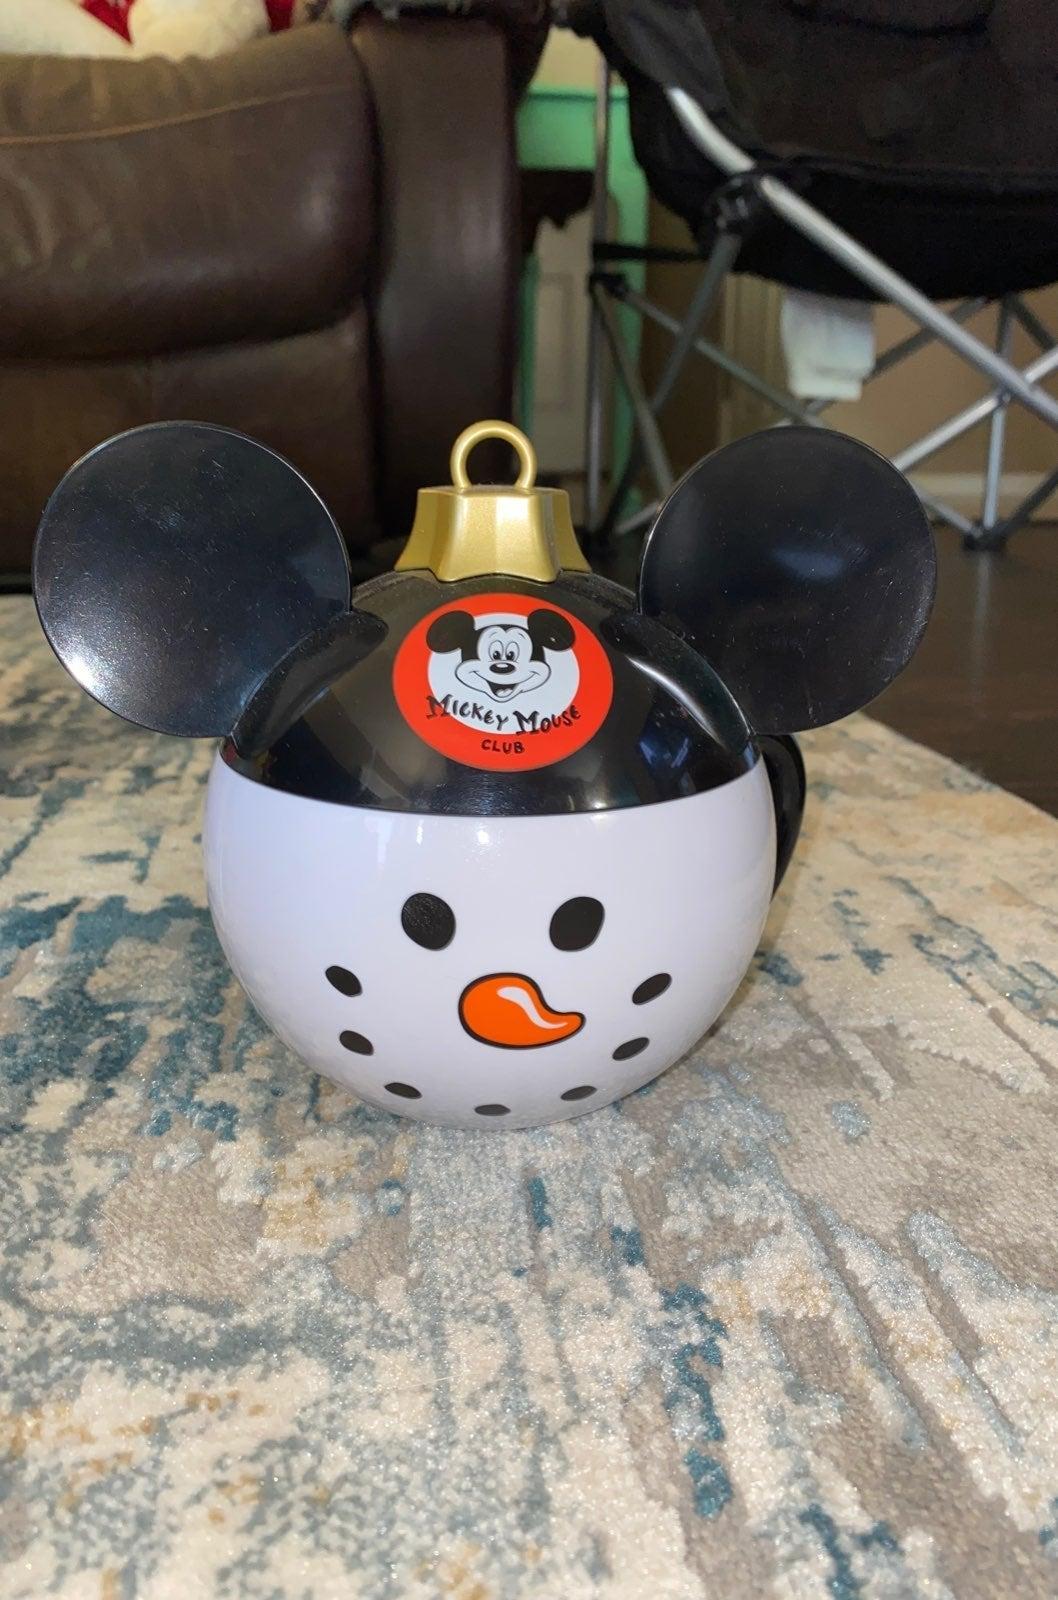 Disney Mickey Mouse Club Xmas Ornament